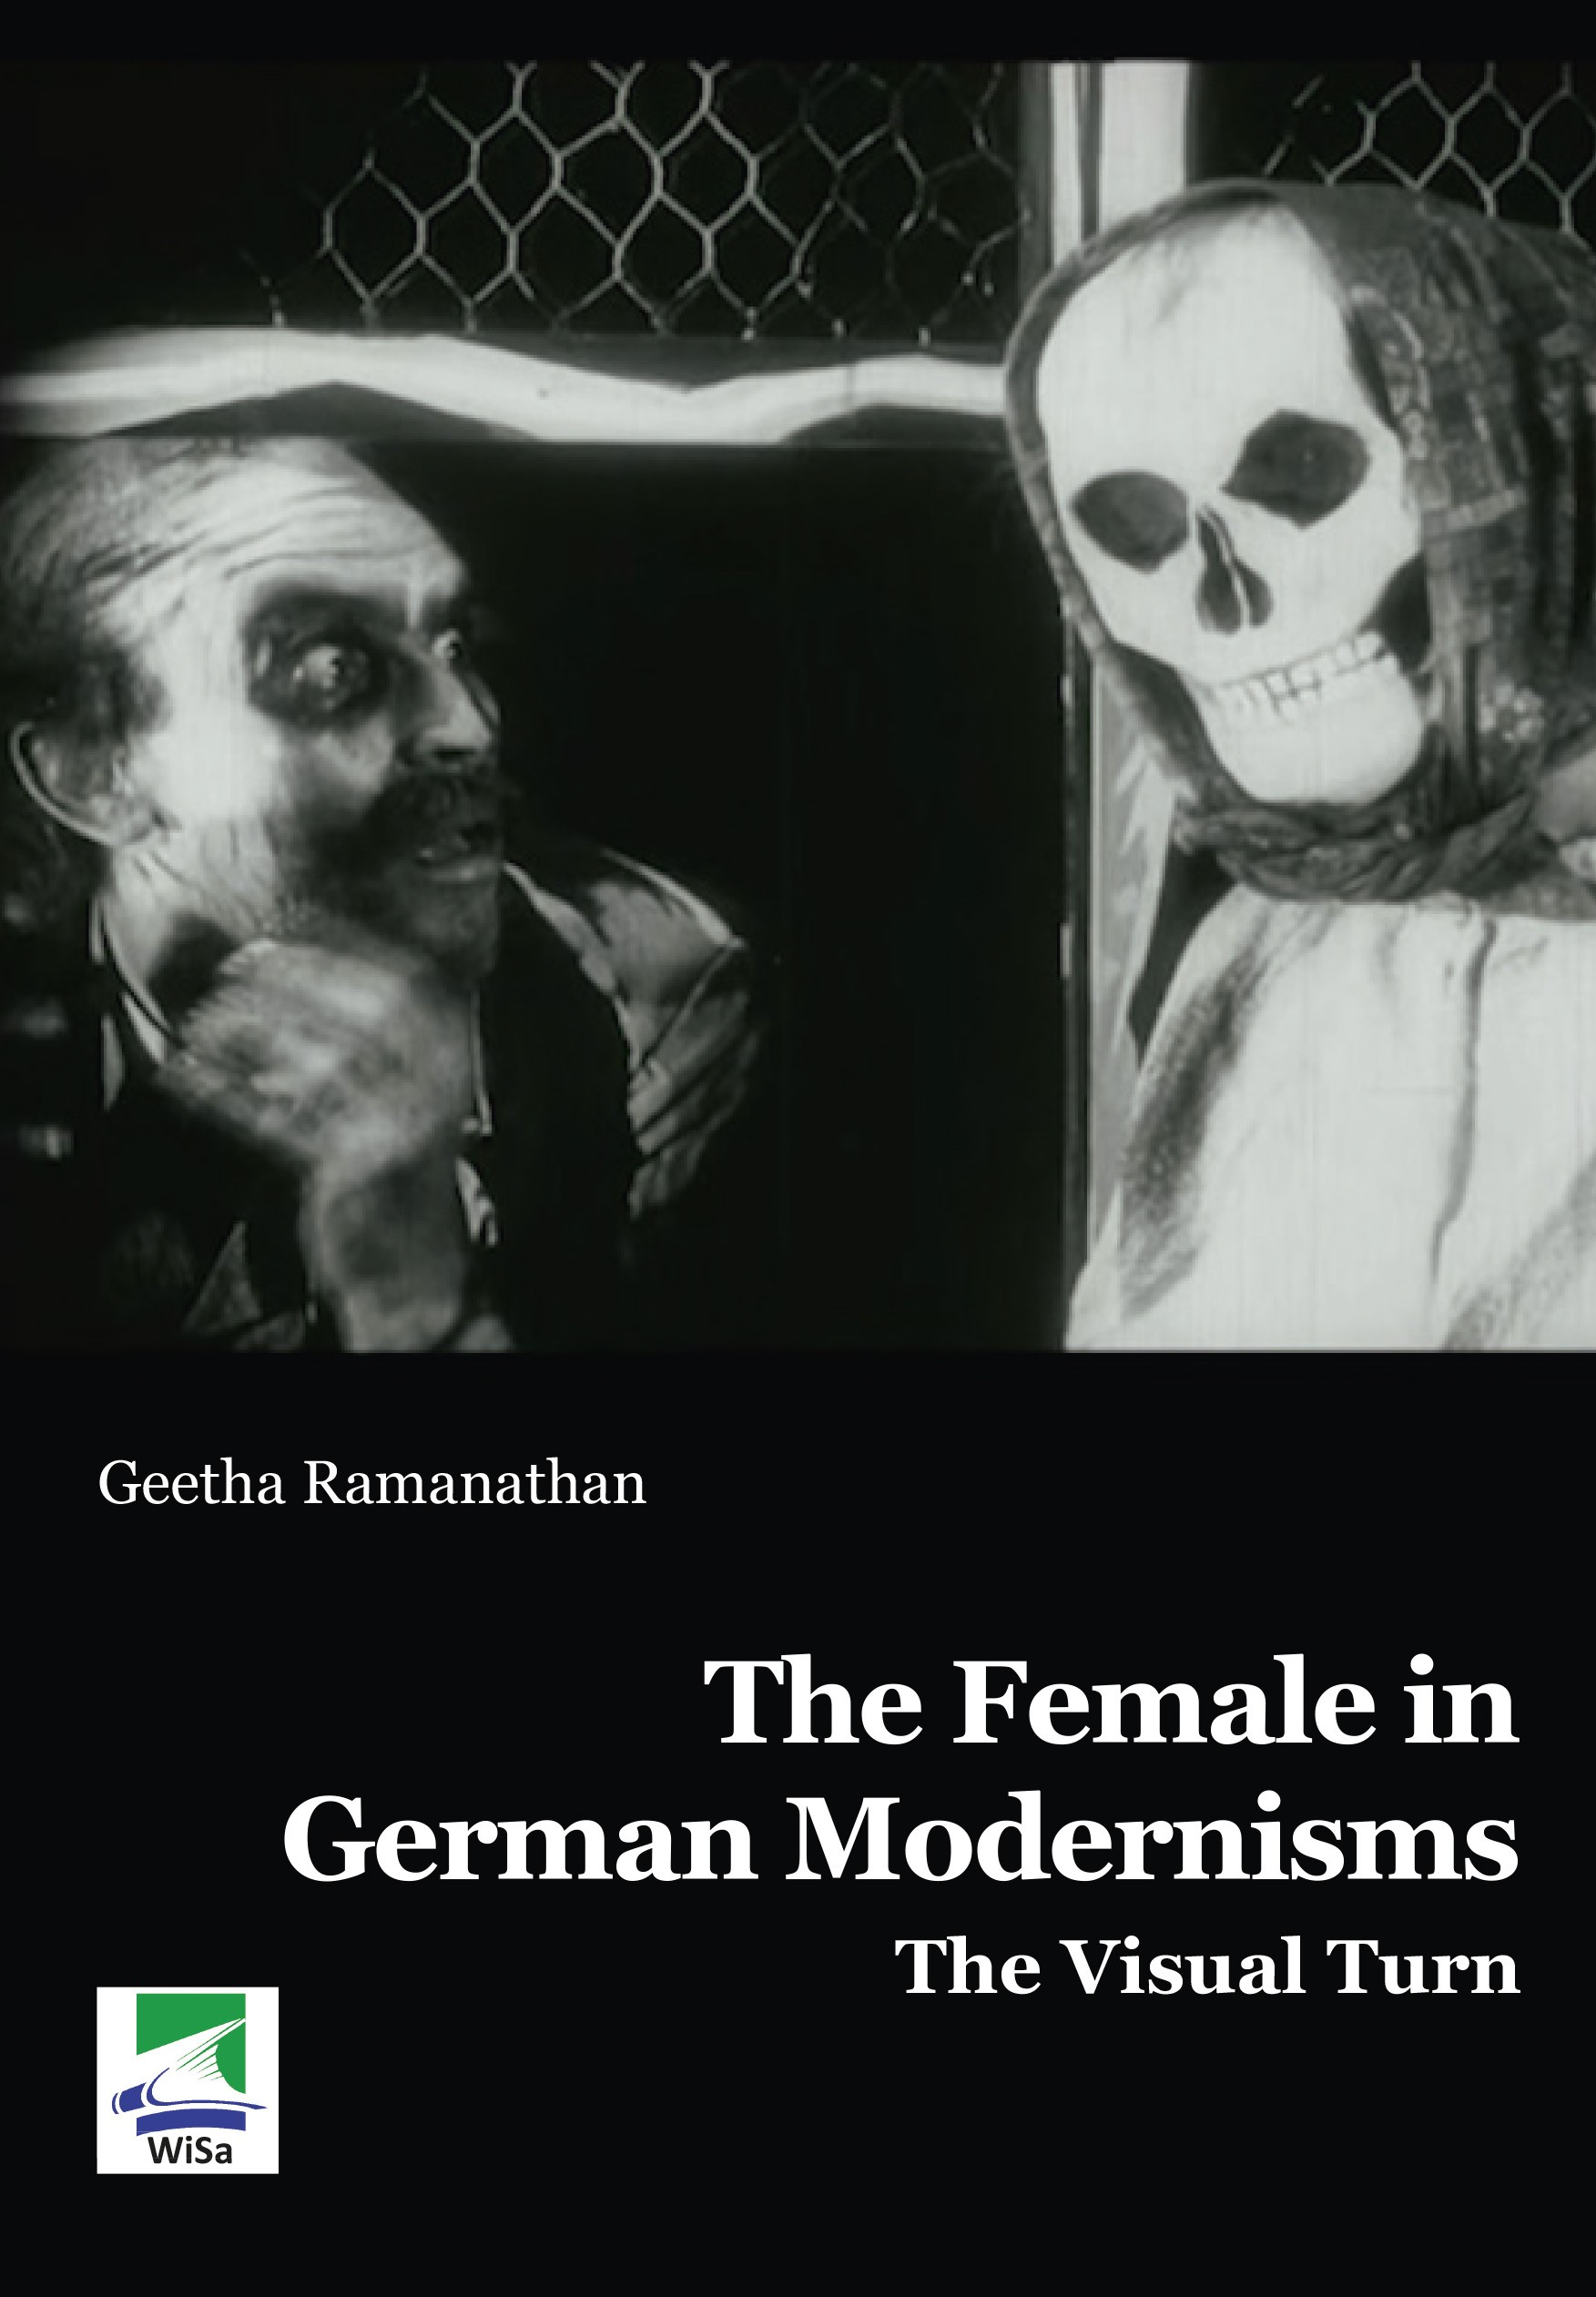 The Female in German Modernisms